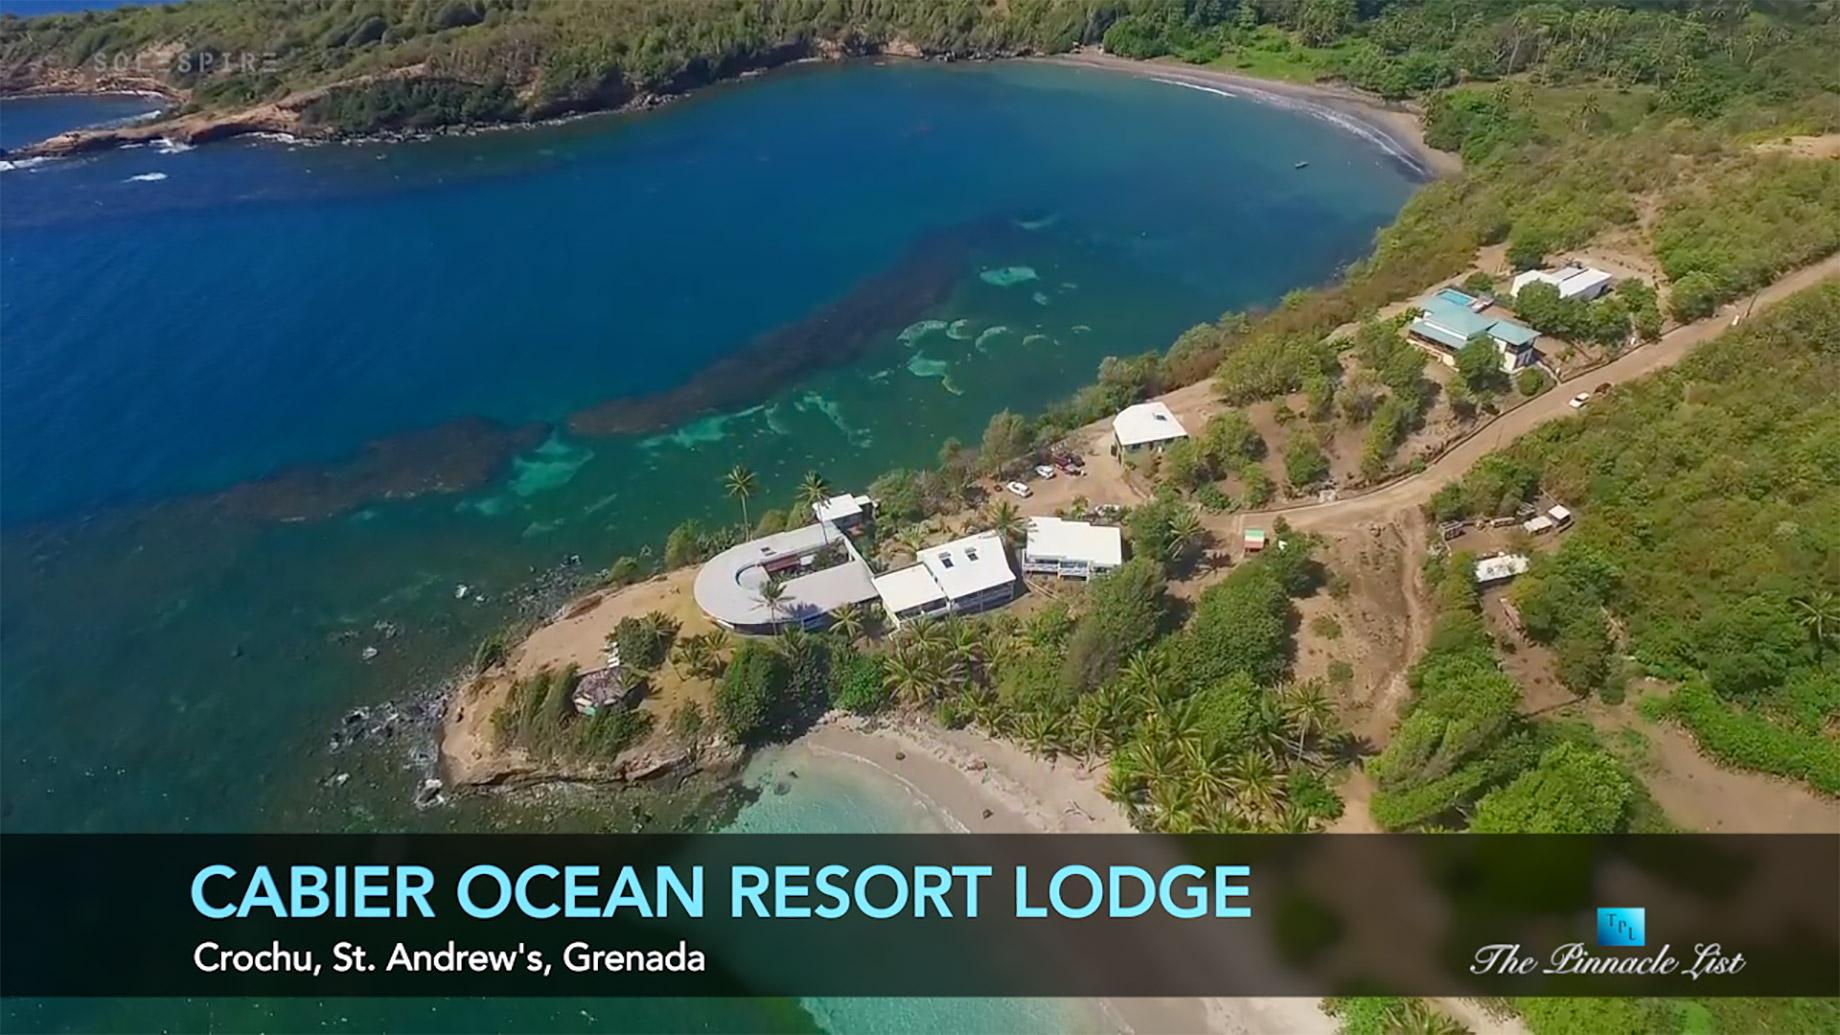 Caribbean Luxury Resort - Cabier Ocean Lodge - Crochu, St. Andrew's, Grenada - Luxury Travel